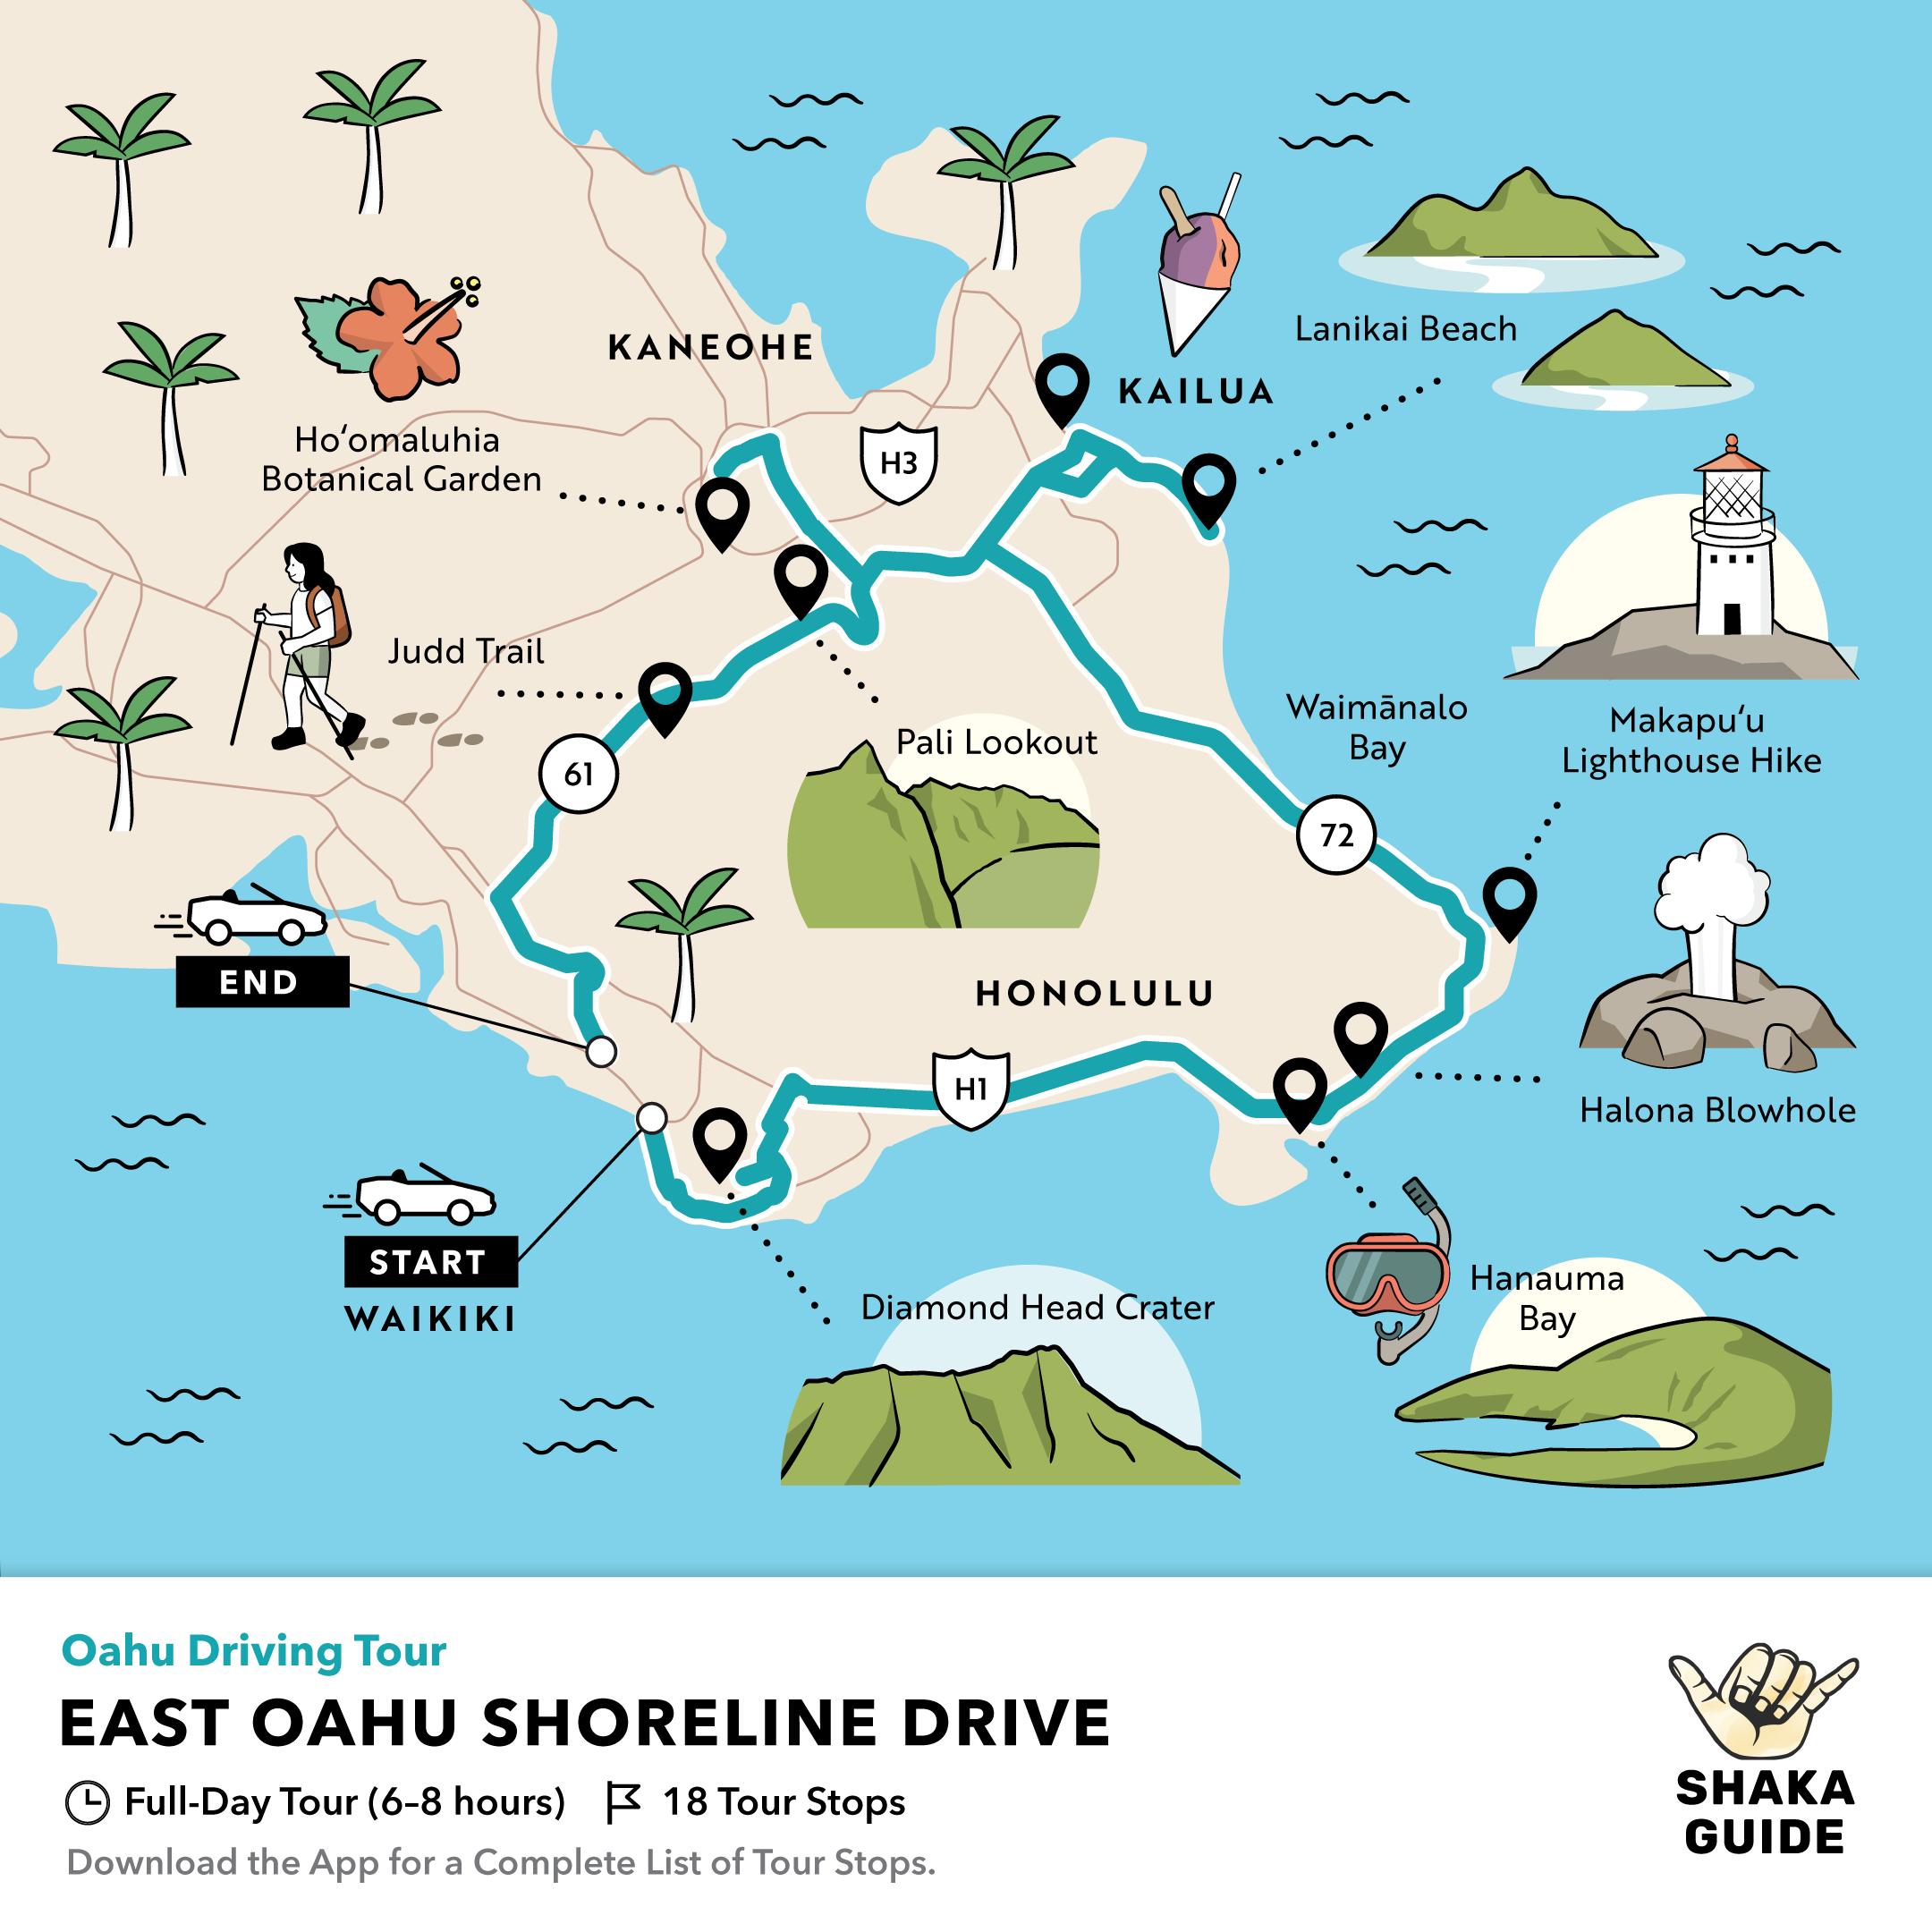 Shaka Guide's East Oahu Shoreline Drive